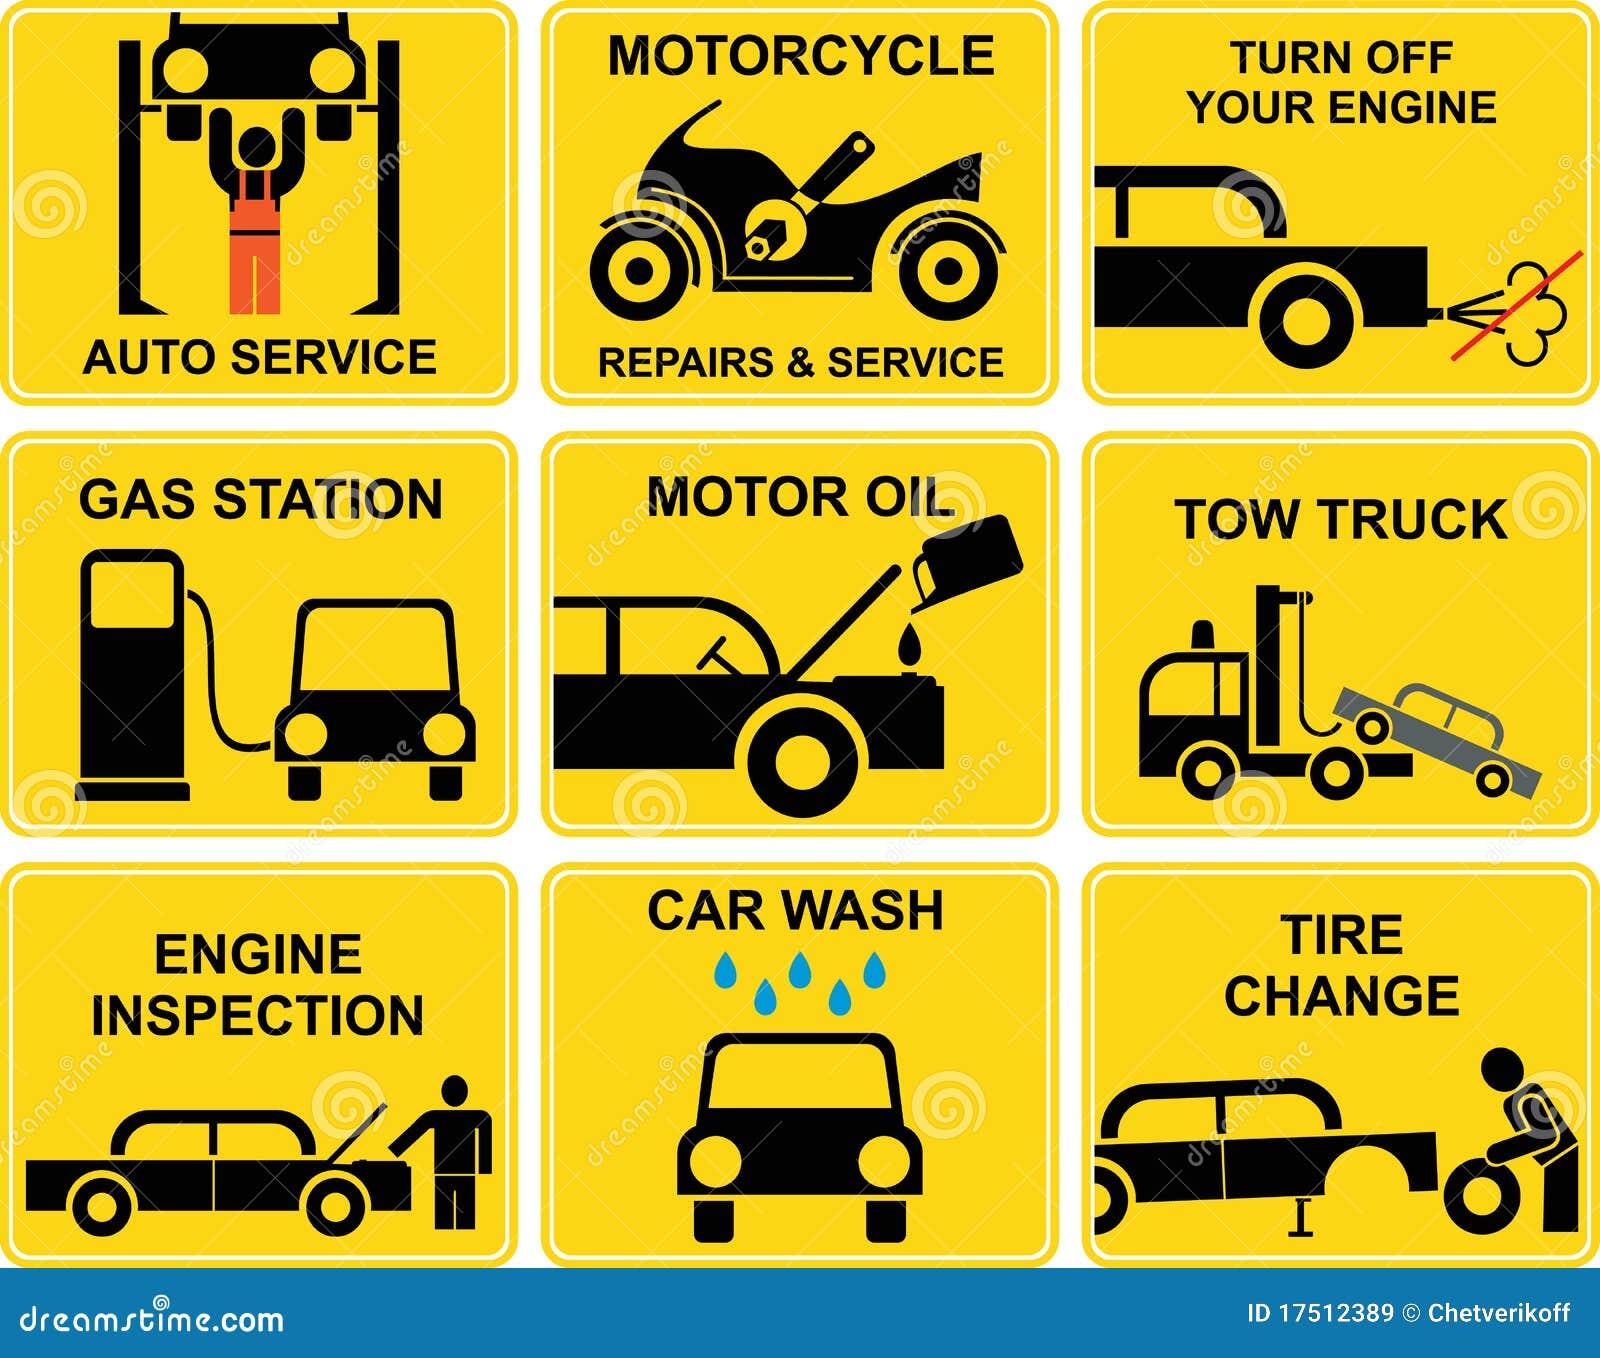 Tucson Oil Change And Car Wash